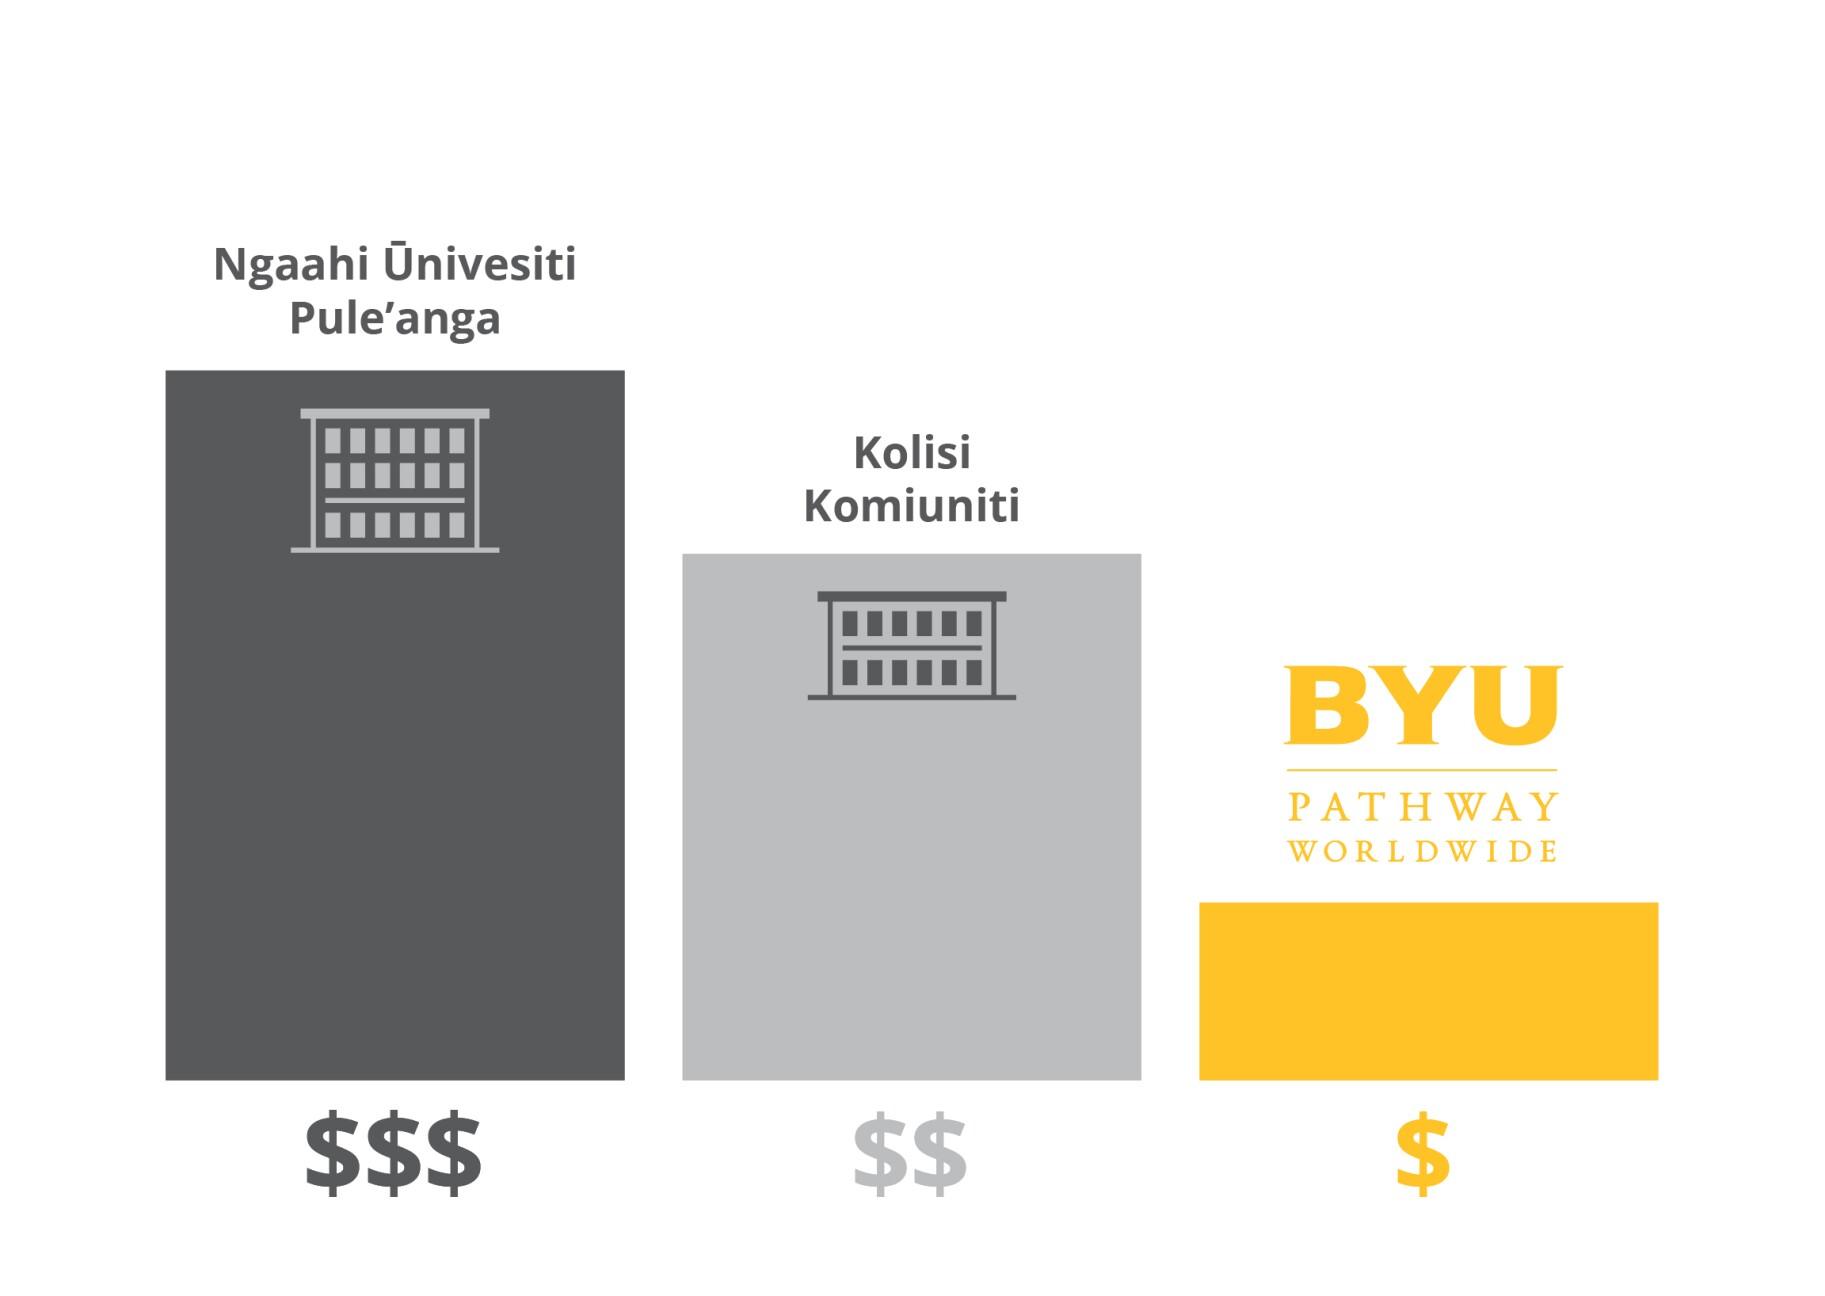 Tuition Cost Comparison - Tongan